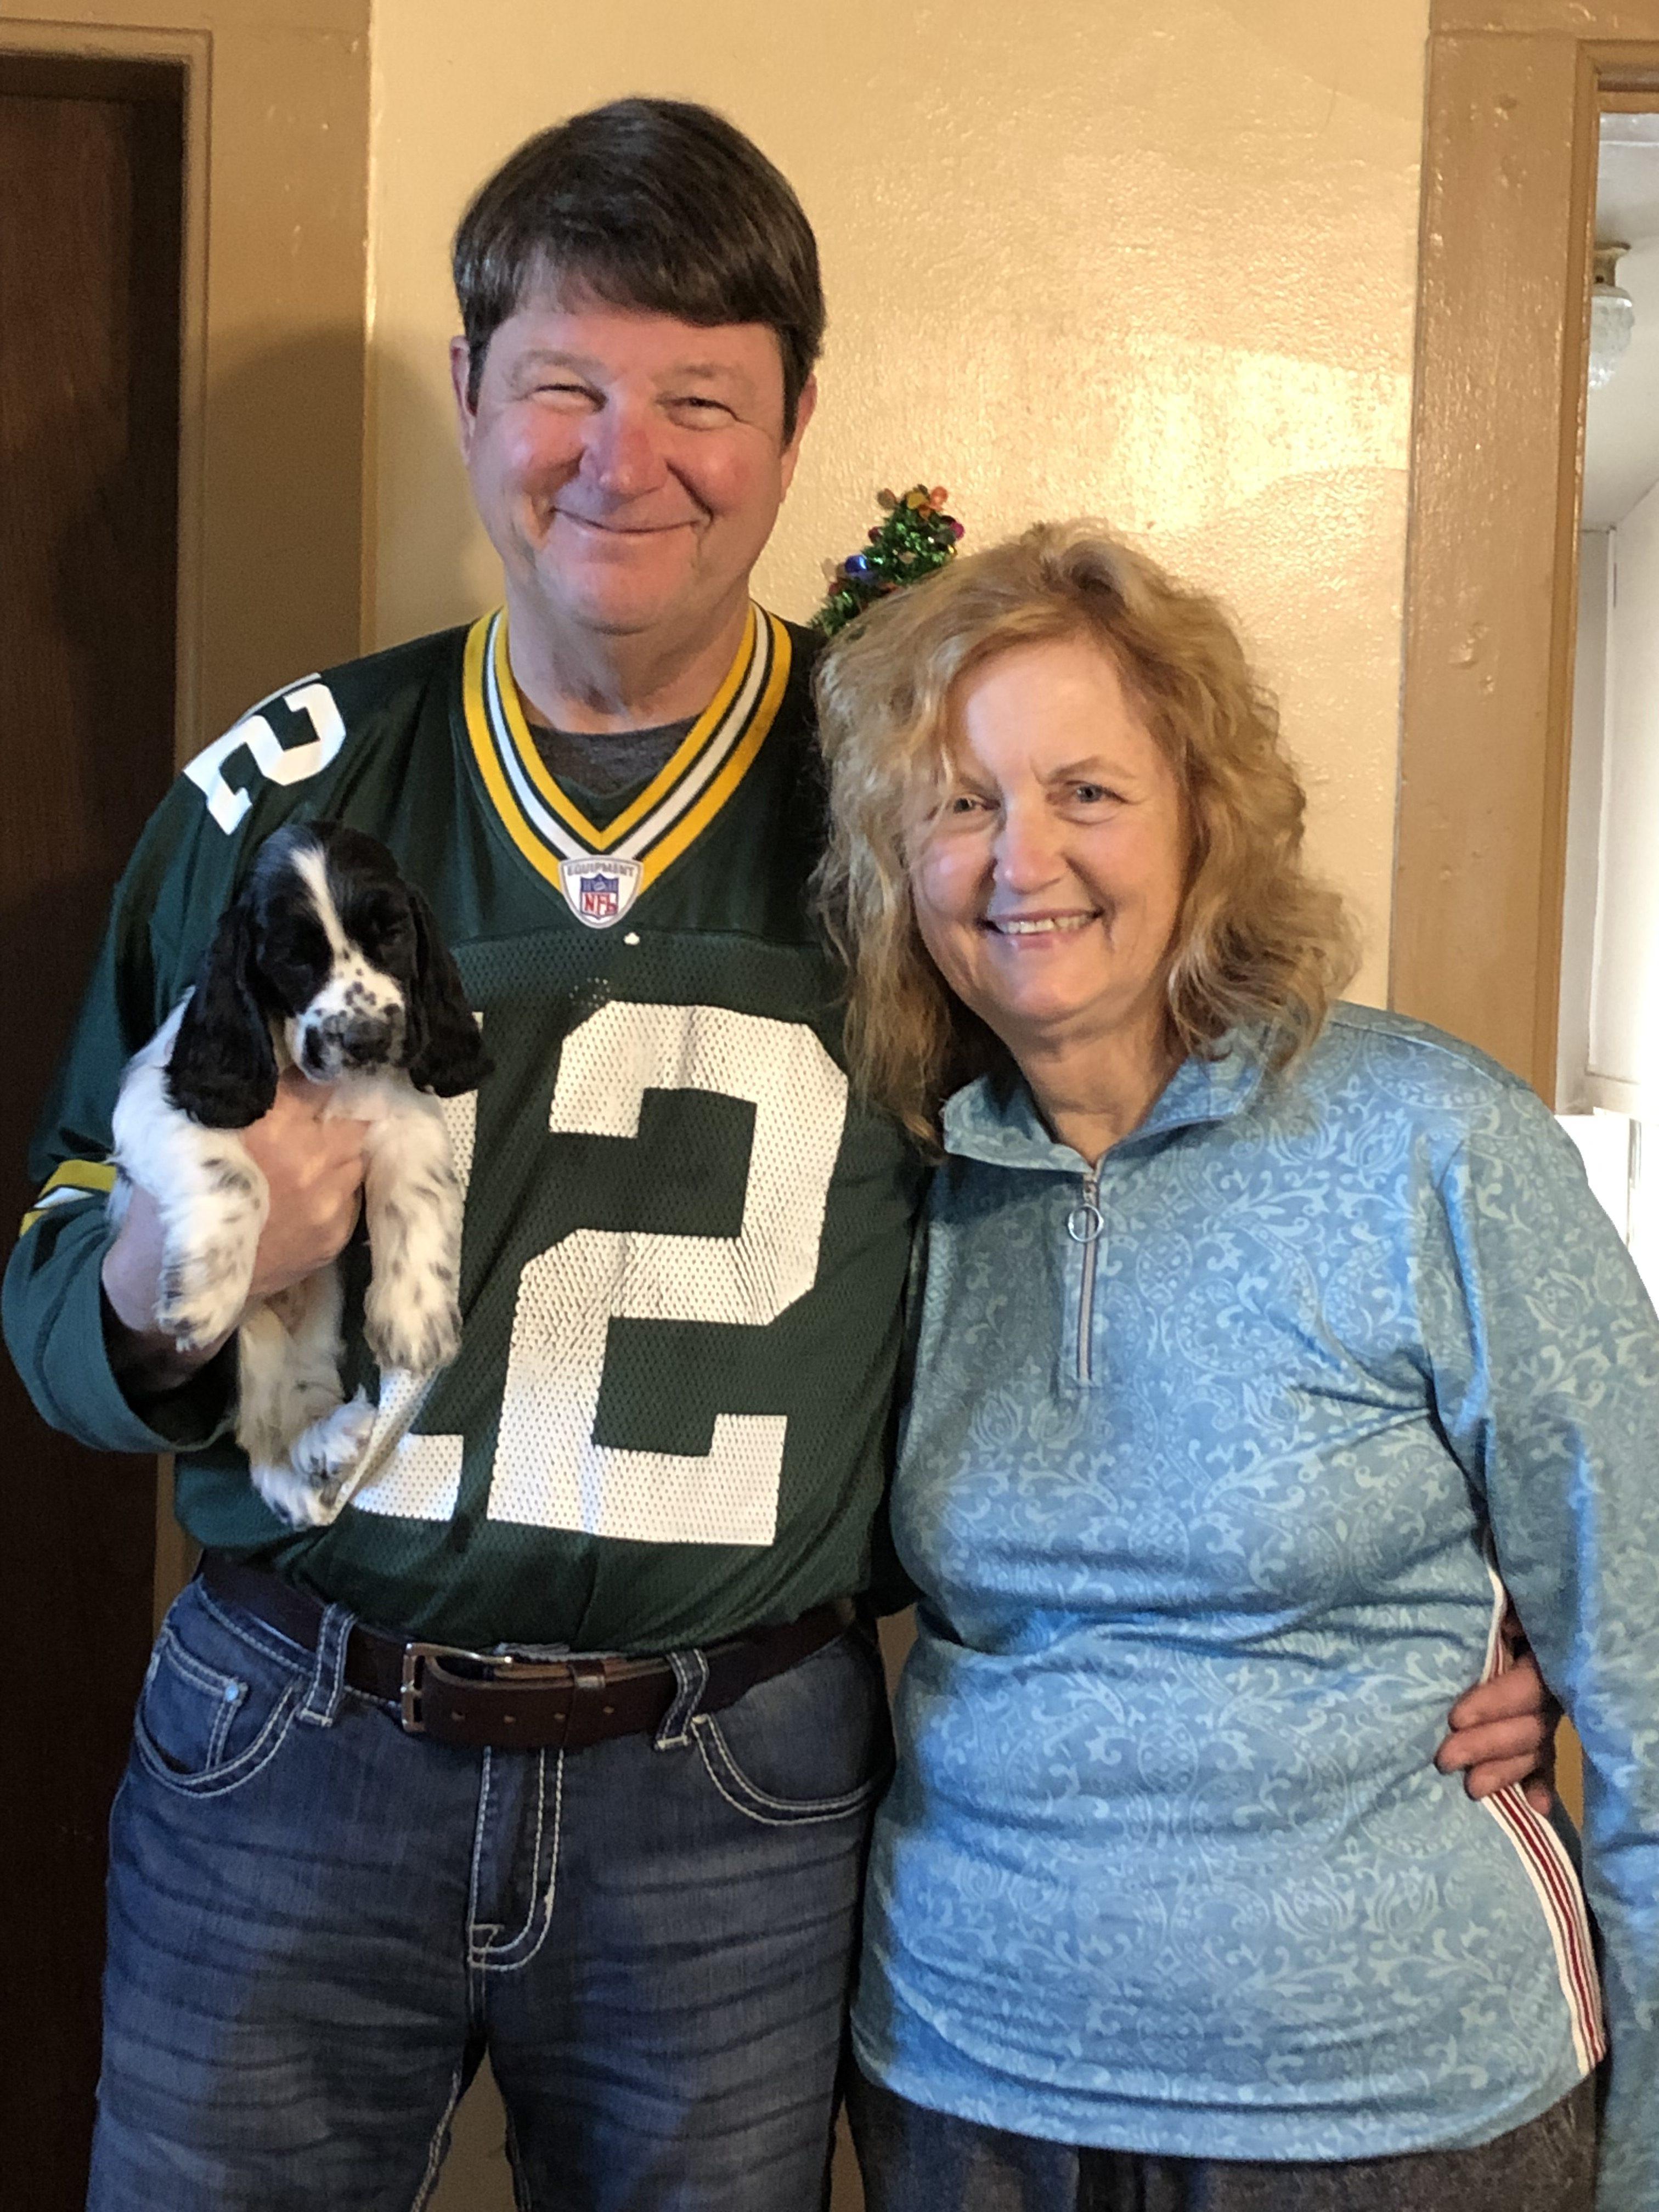 Jasper family-Jack Kiefer and Michelle O Keefe